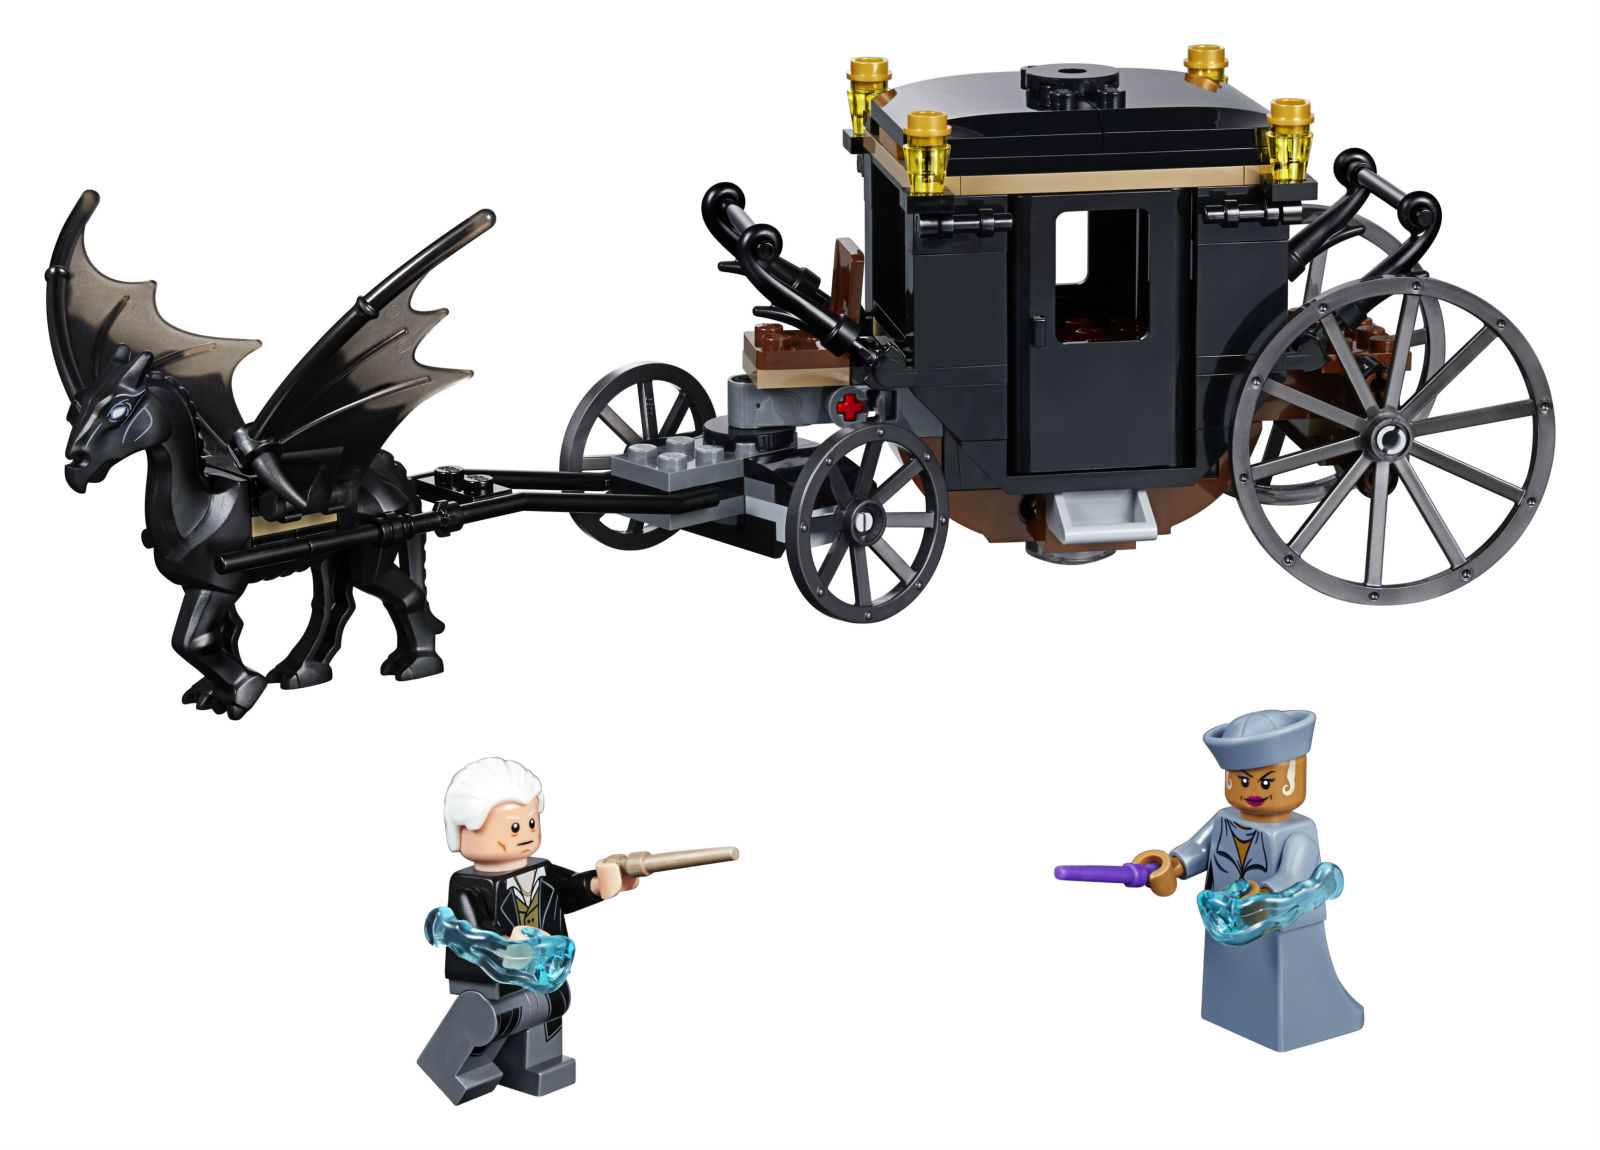 Animali Fantastici: I crimini di Grindelwald, il set Lego dedicato al film